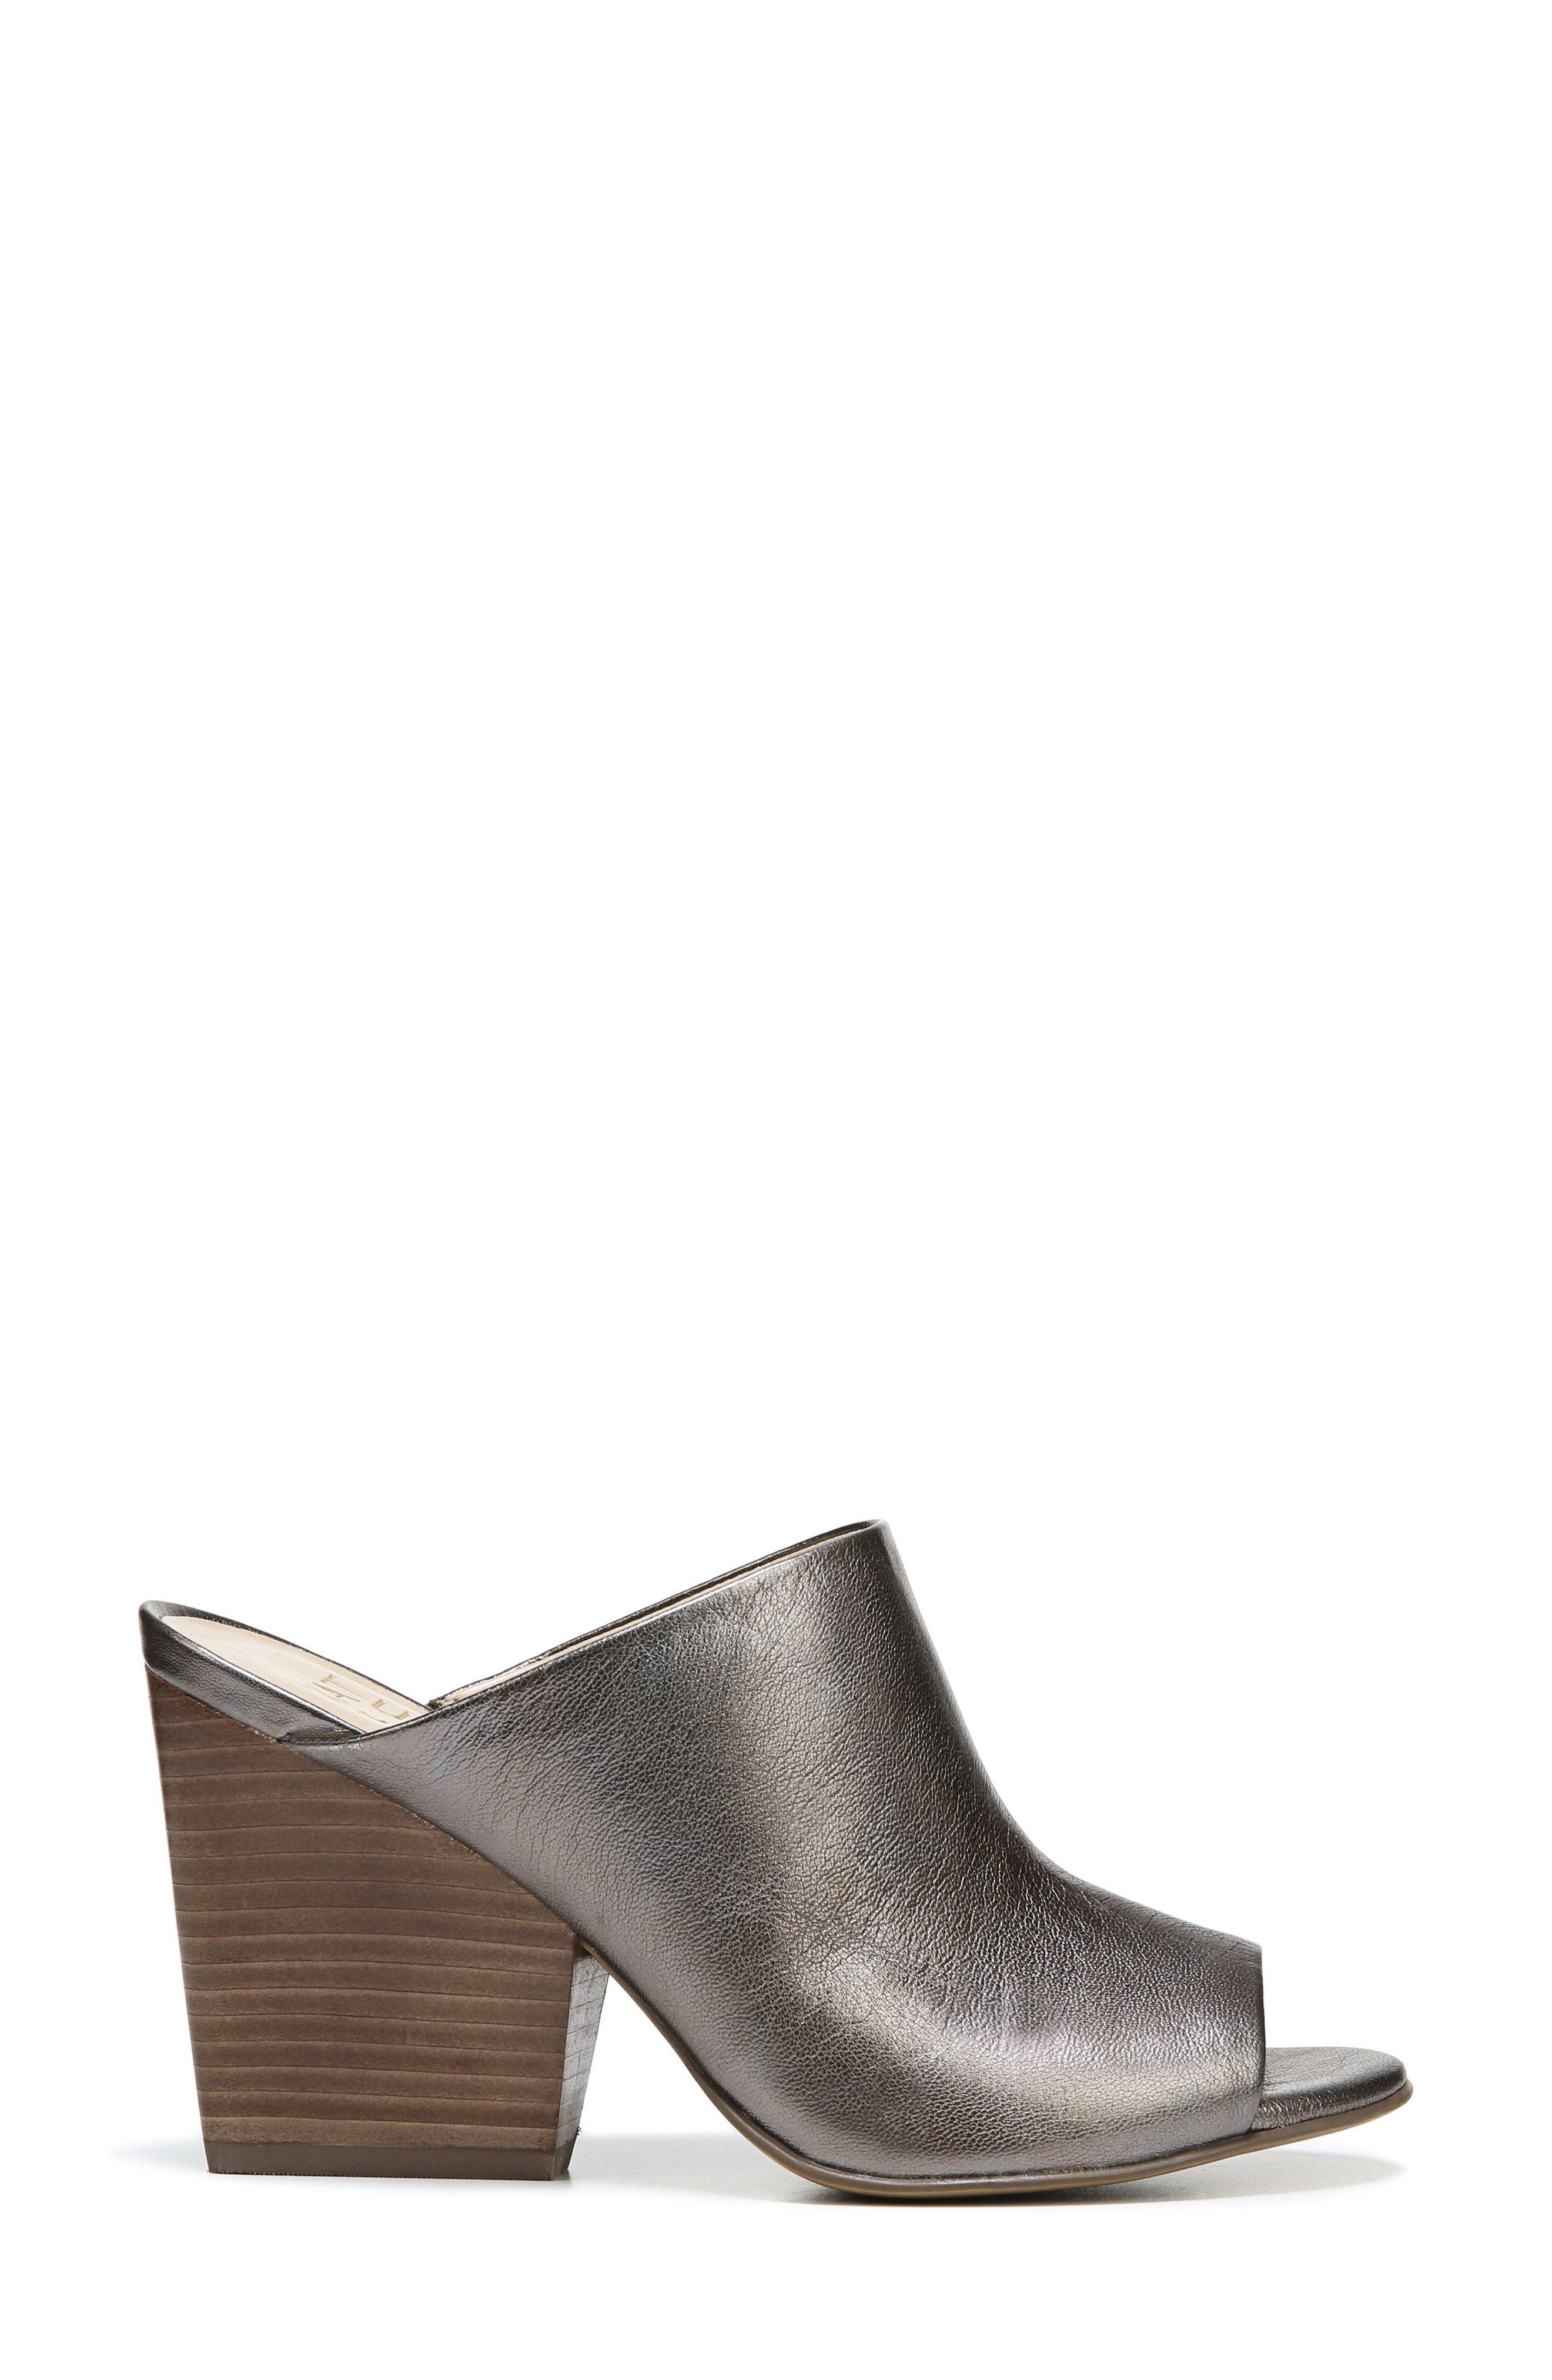 Sloan Sandal,                             Alternate thumbnail 3, color,                             Gunmetal Leather